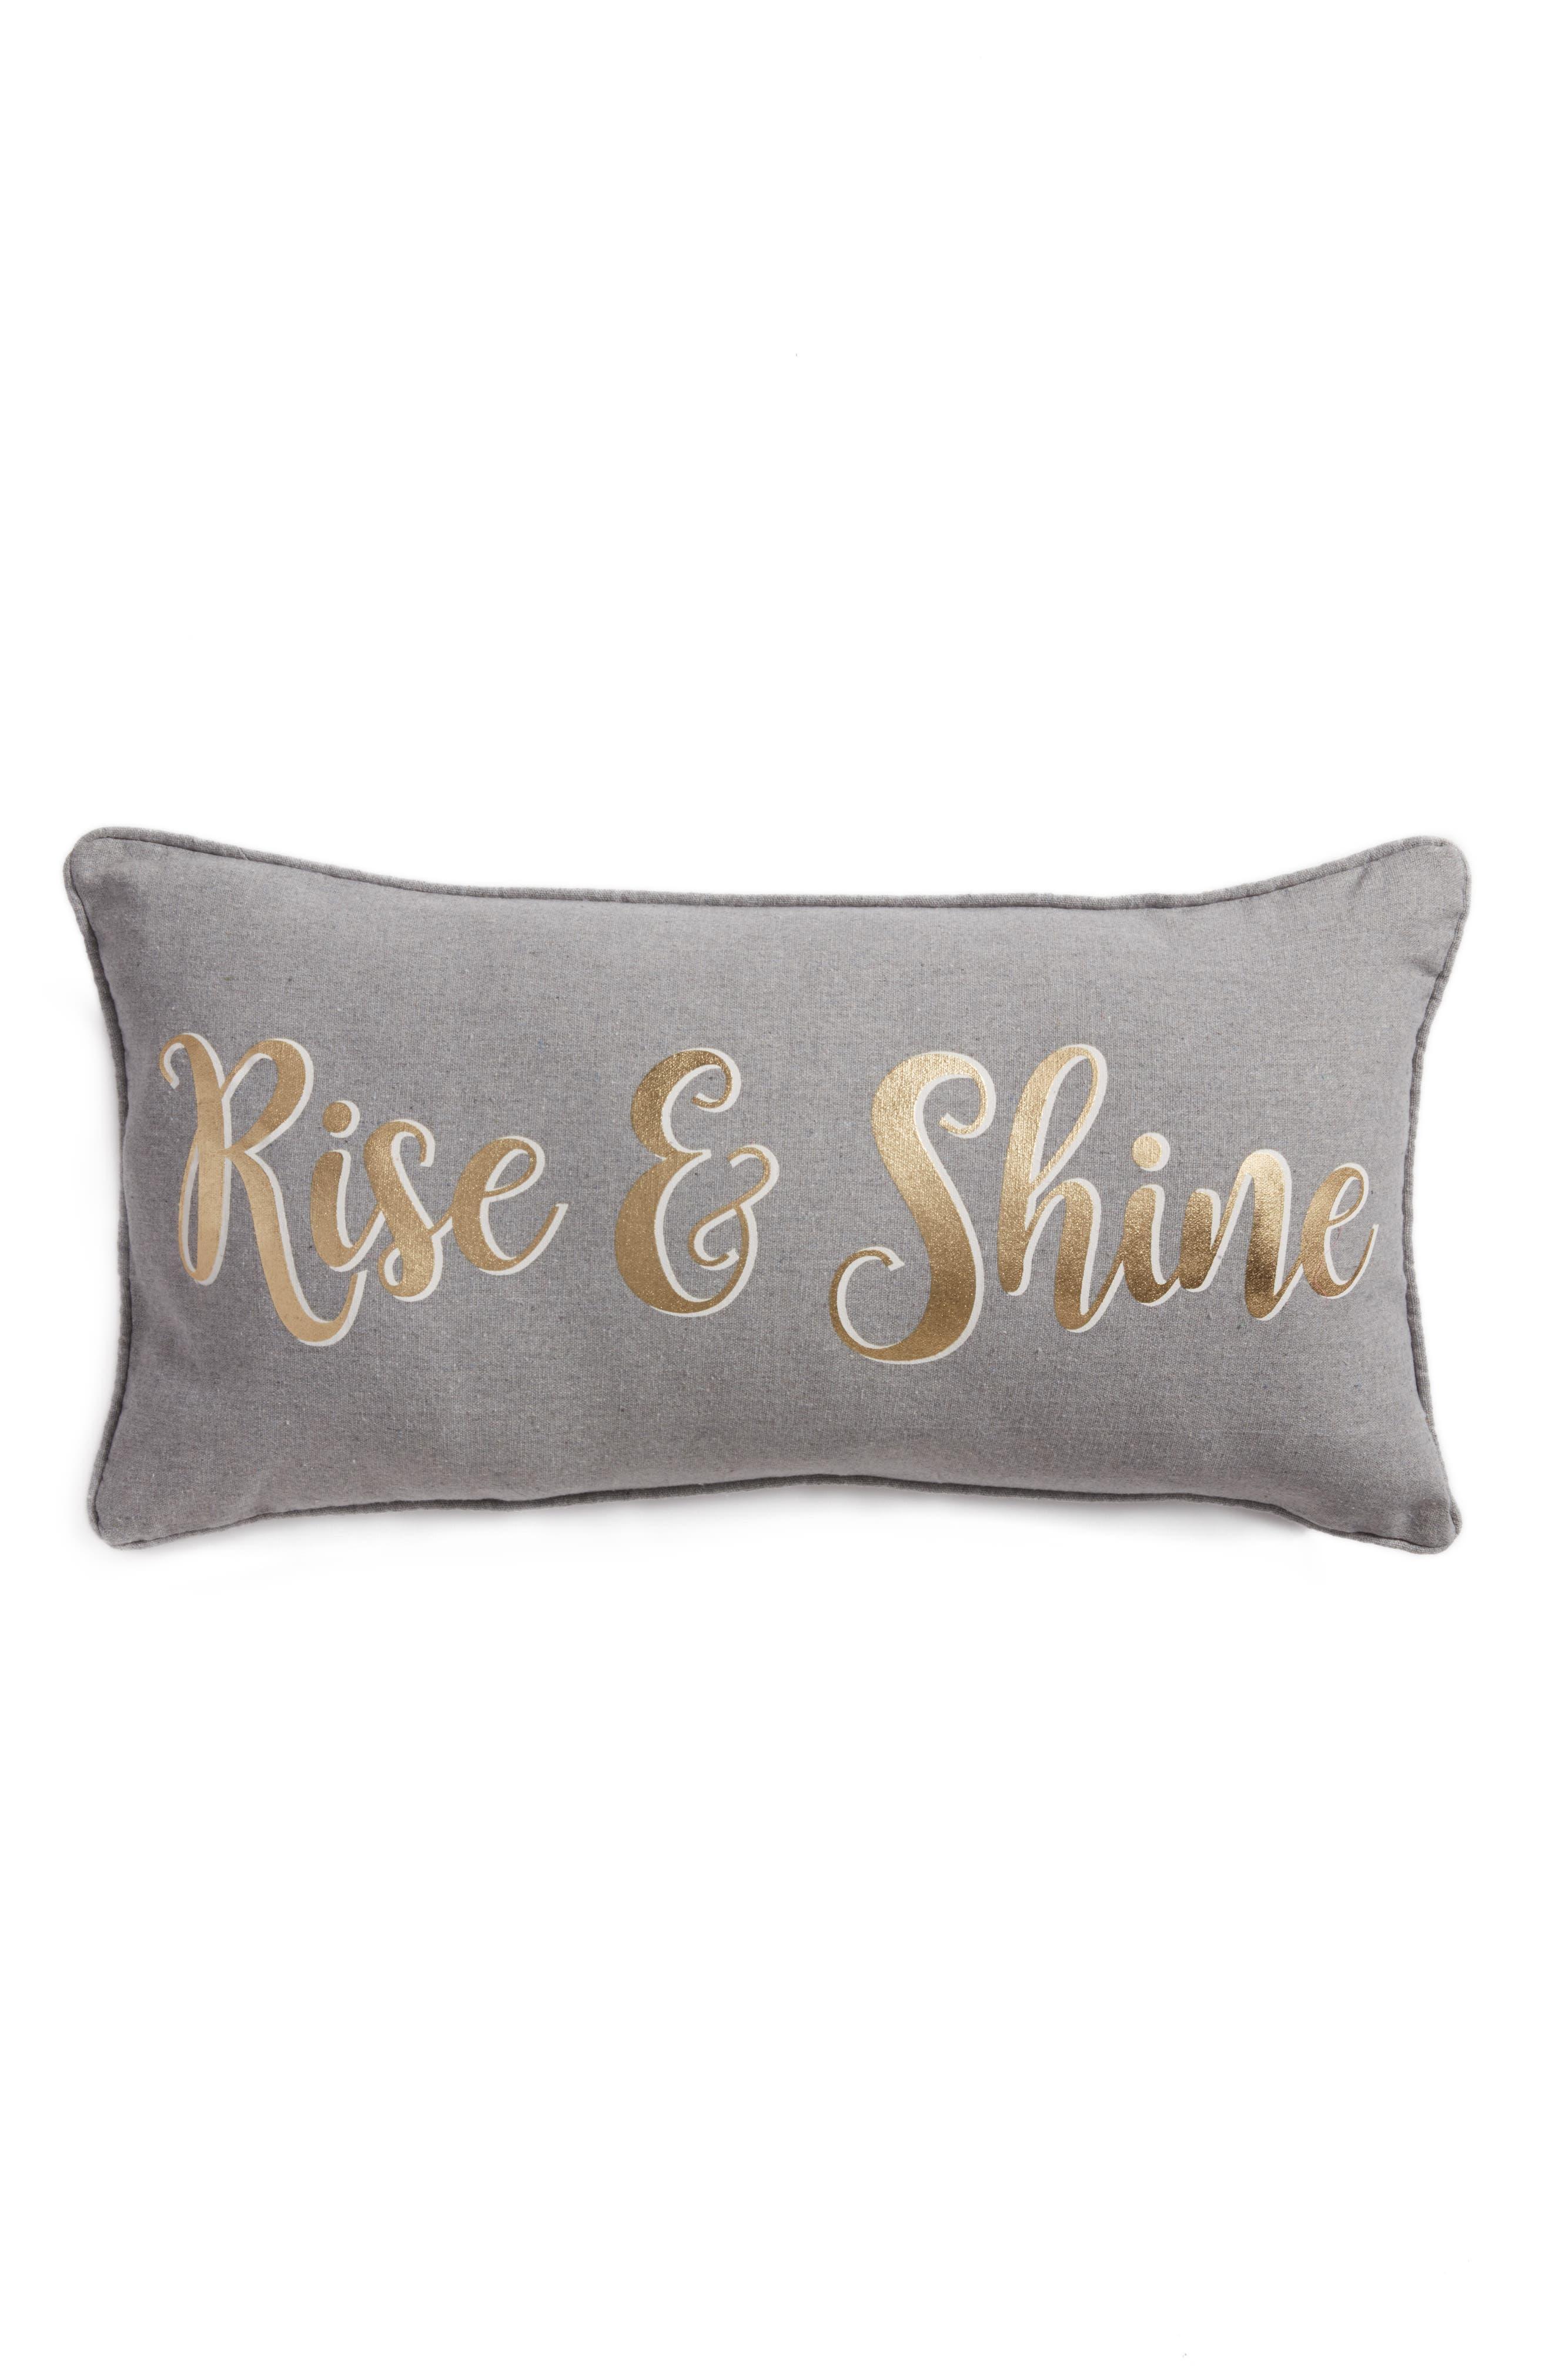 Arden Rise & Shine Accent Pillow,                             Main thumbnail 1, color,                             Grey